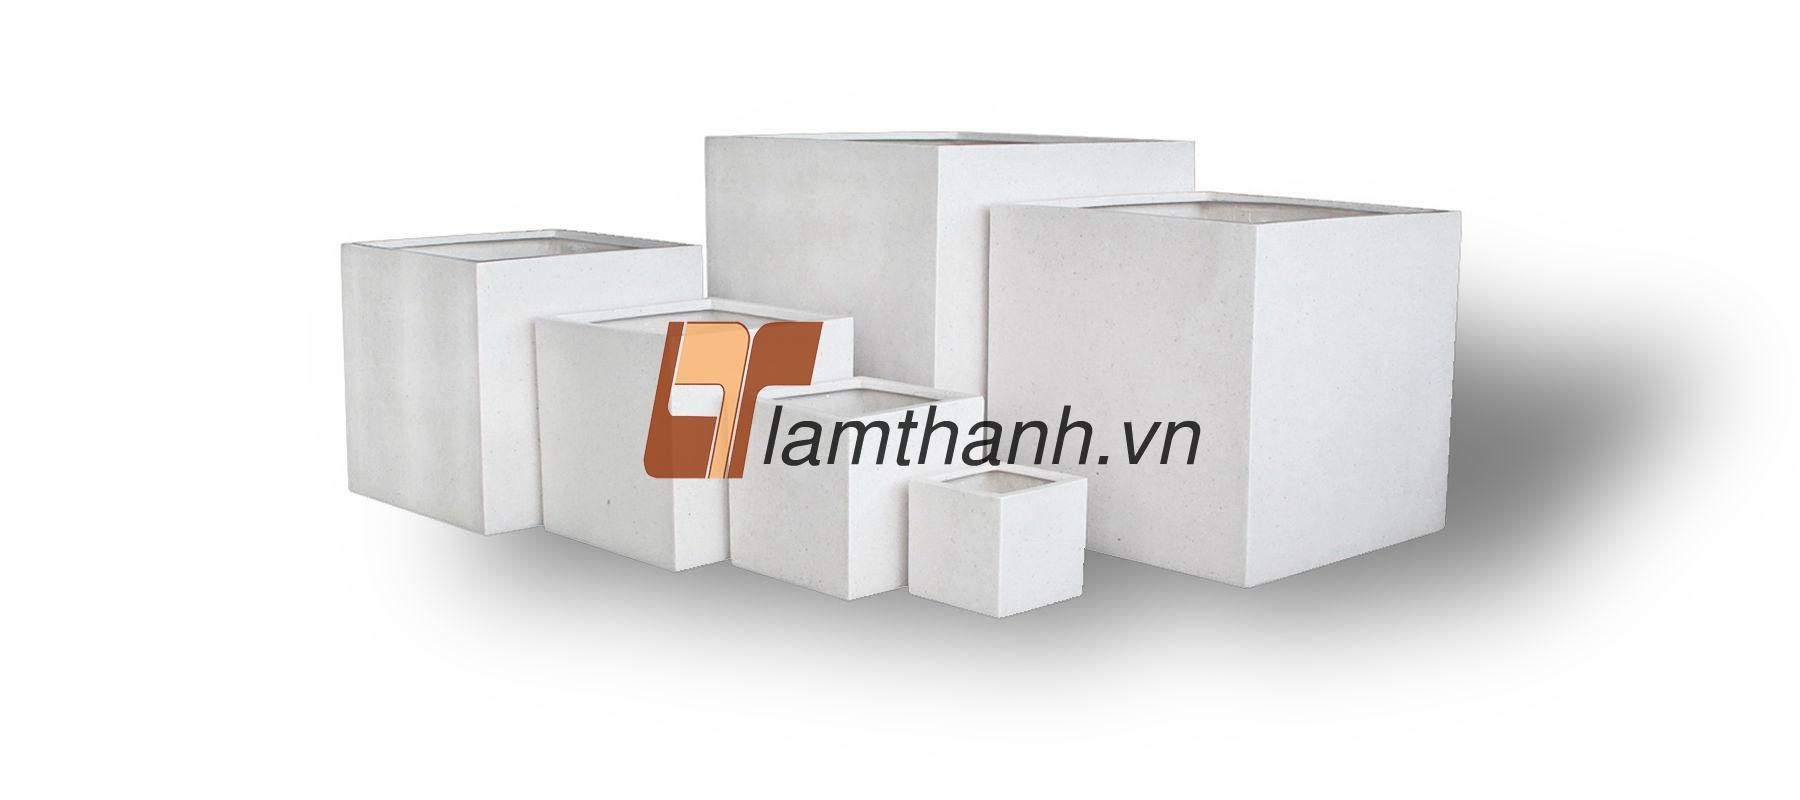 vietnam polyresin, fiberstone 03